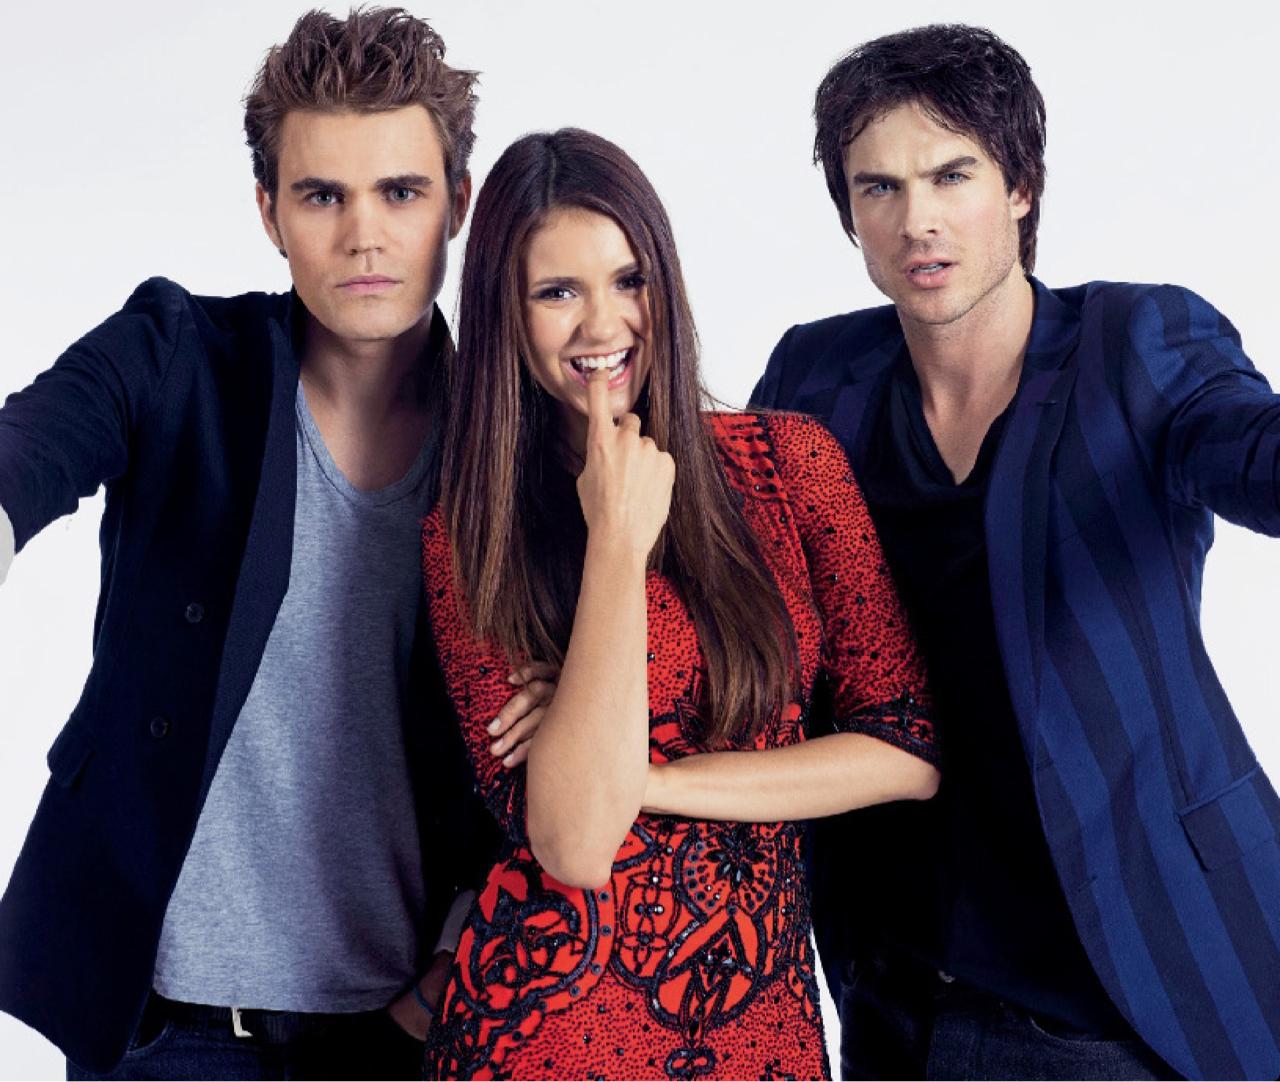 The Vampire Diaries Nina Dobrev Despised Paul Wesley at First